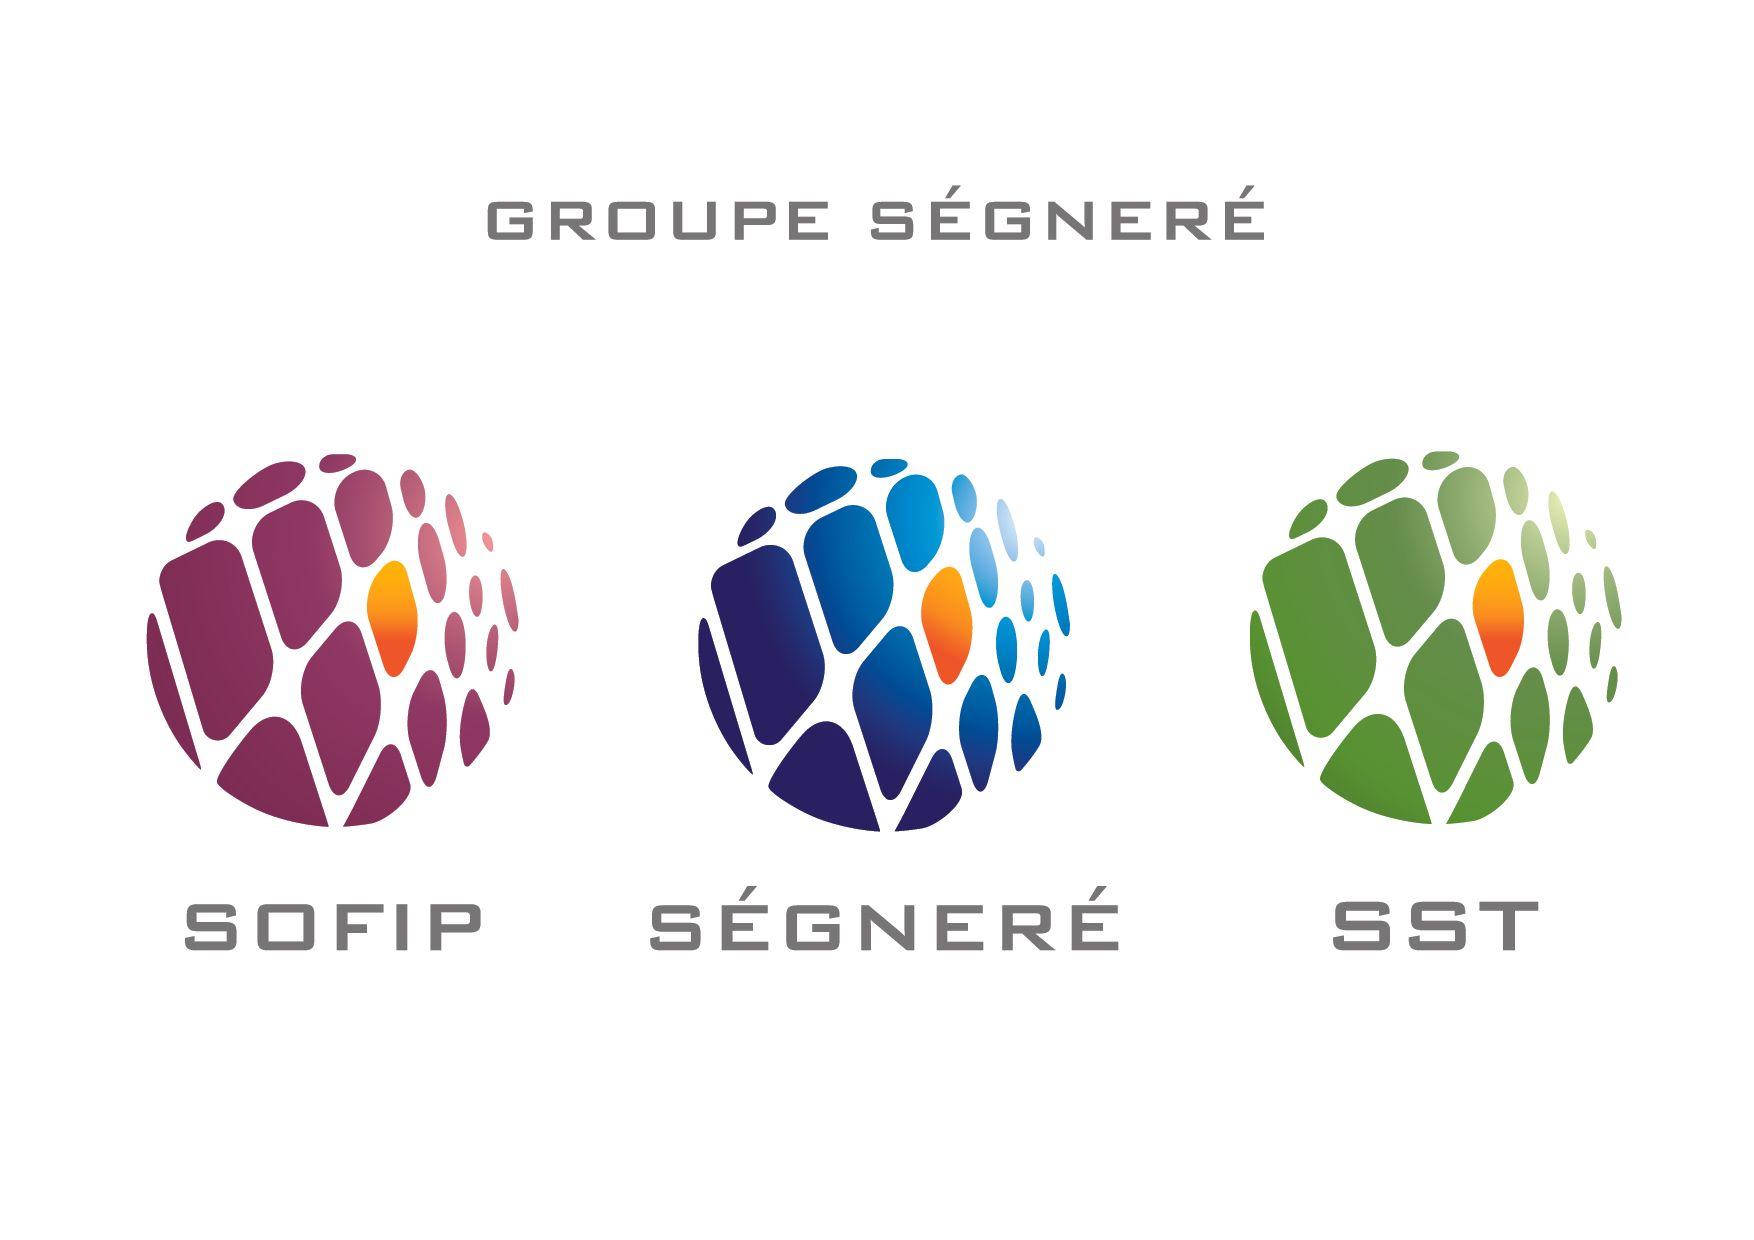 Groupe Segnere